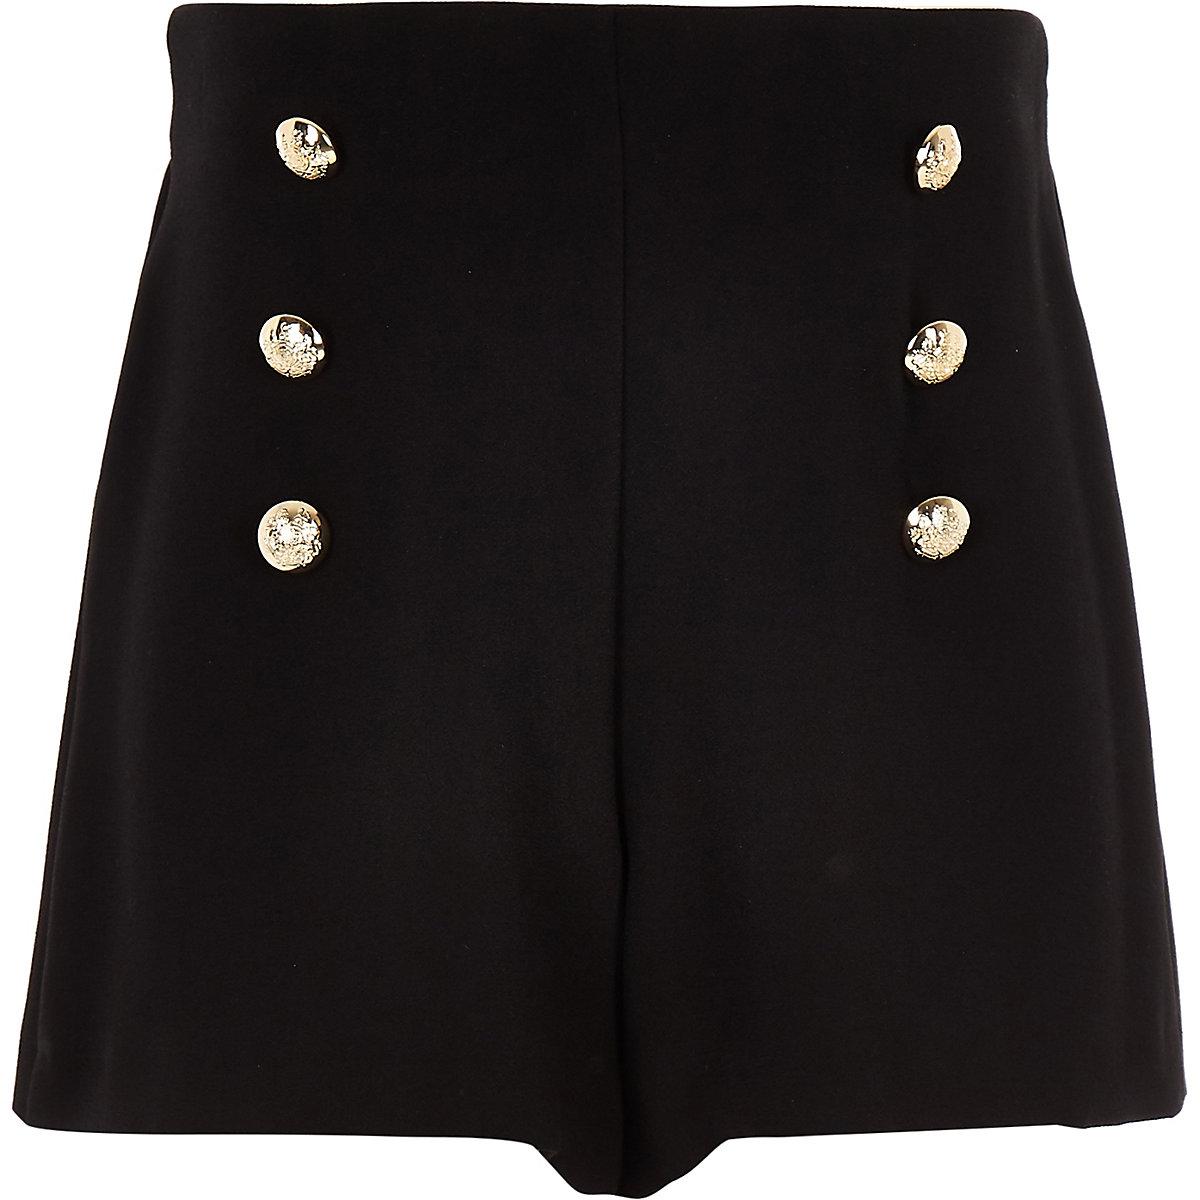 Girls black button detail shorts